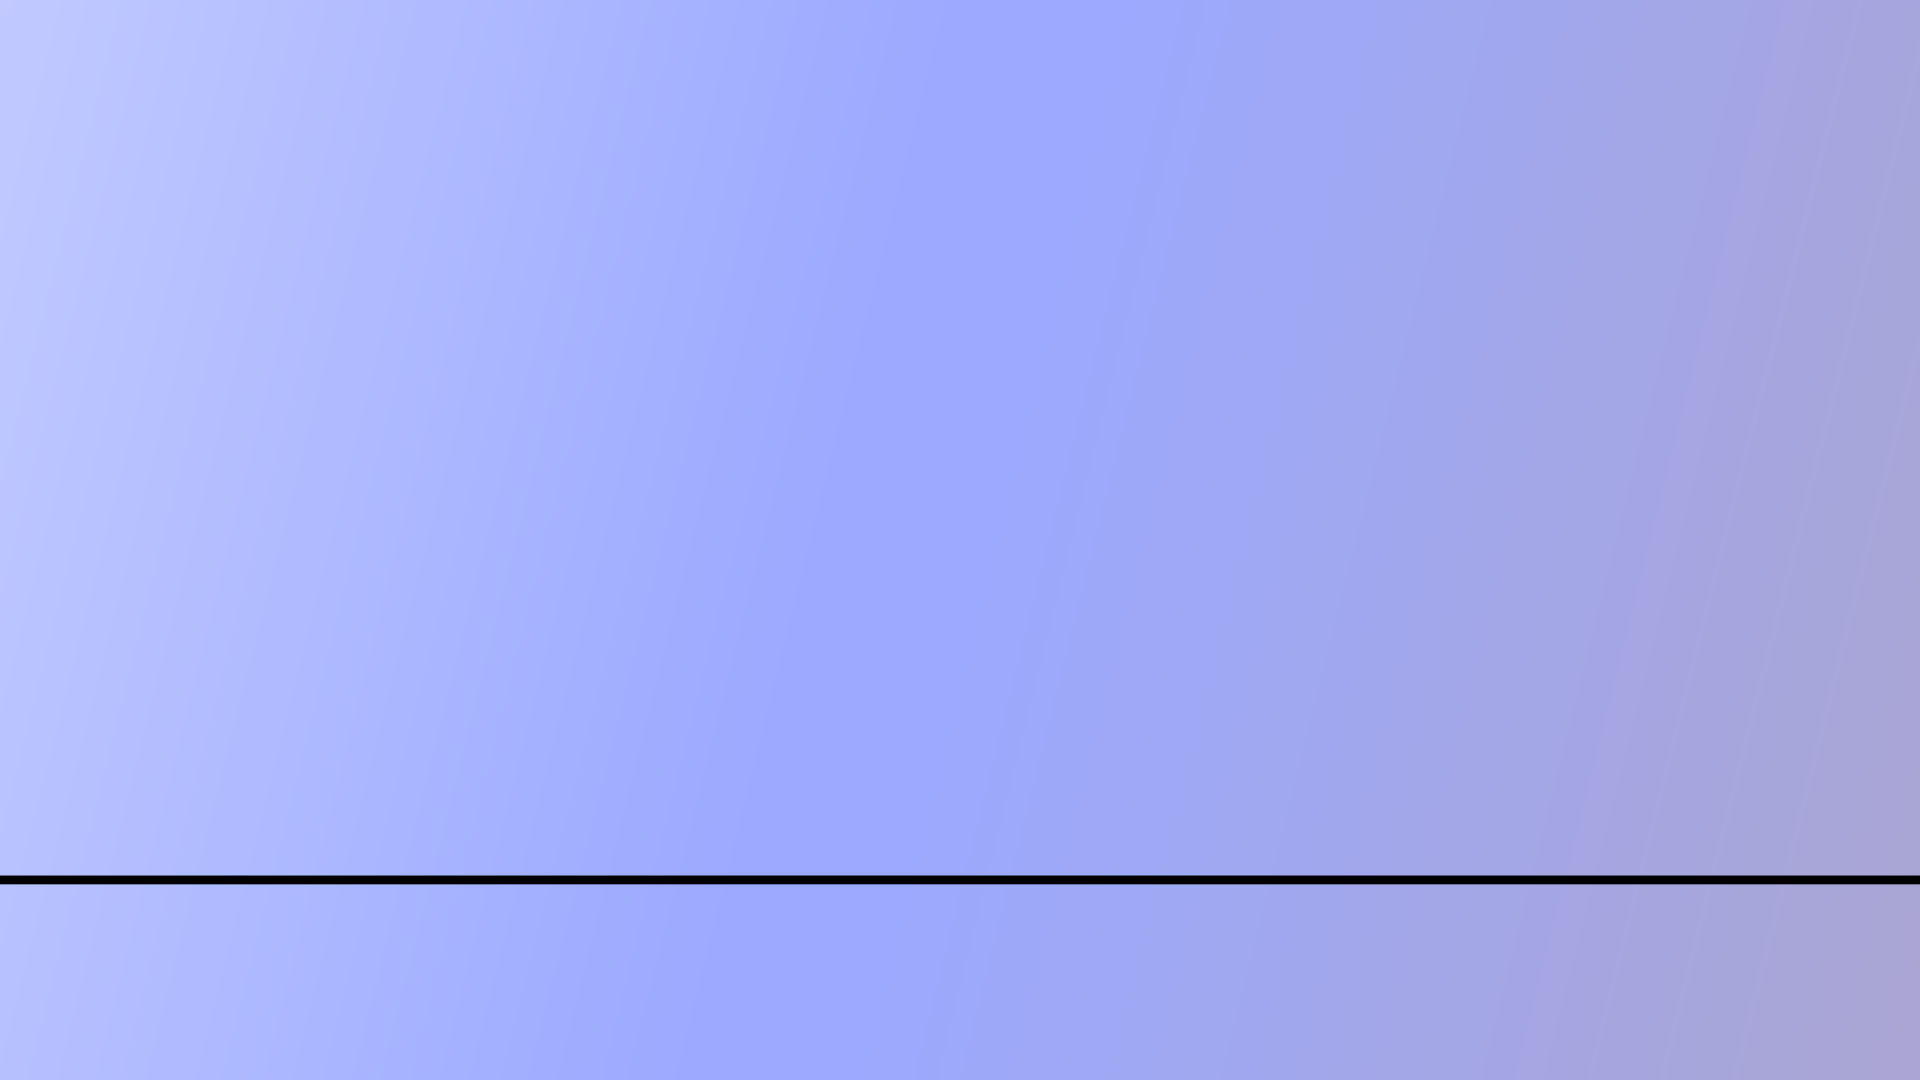 communication/animation/1920x1080-weekend2-sara-sejin-chang/png/00086.png